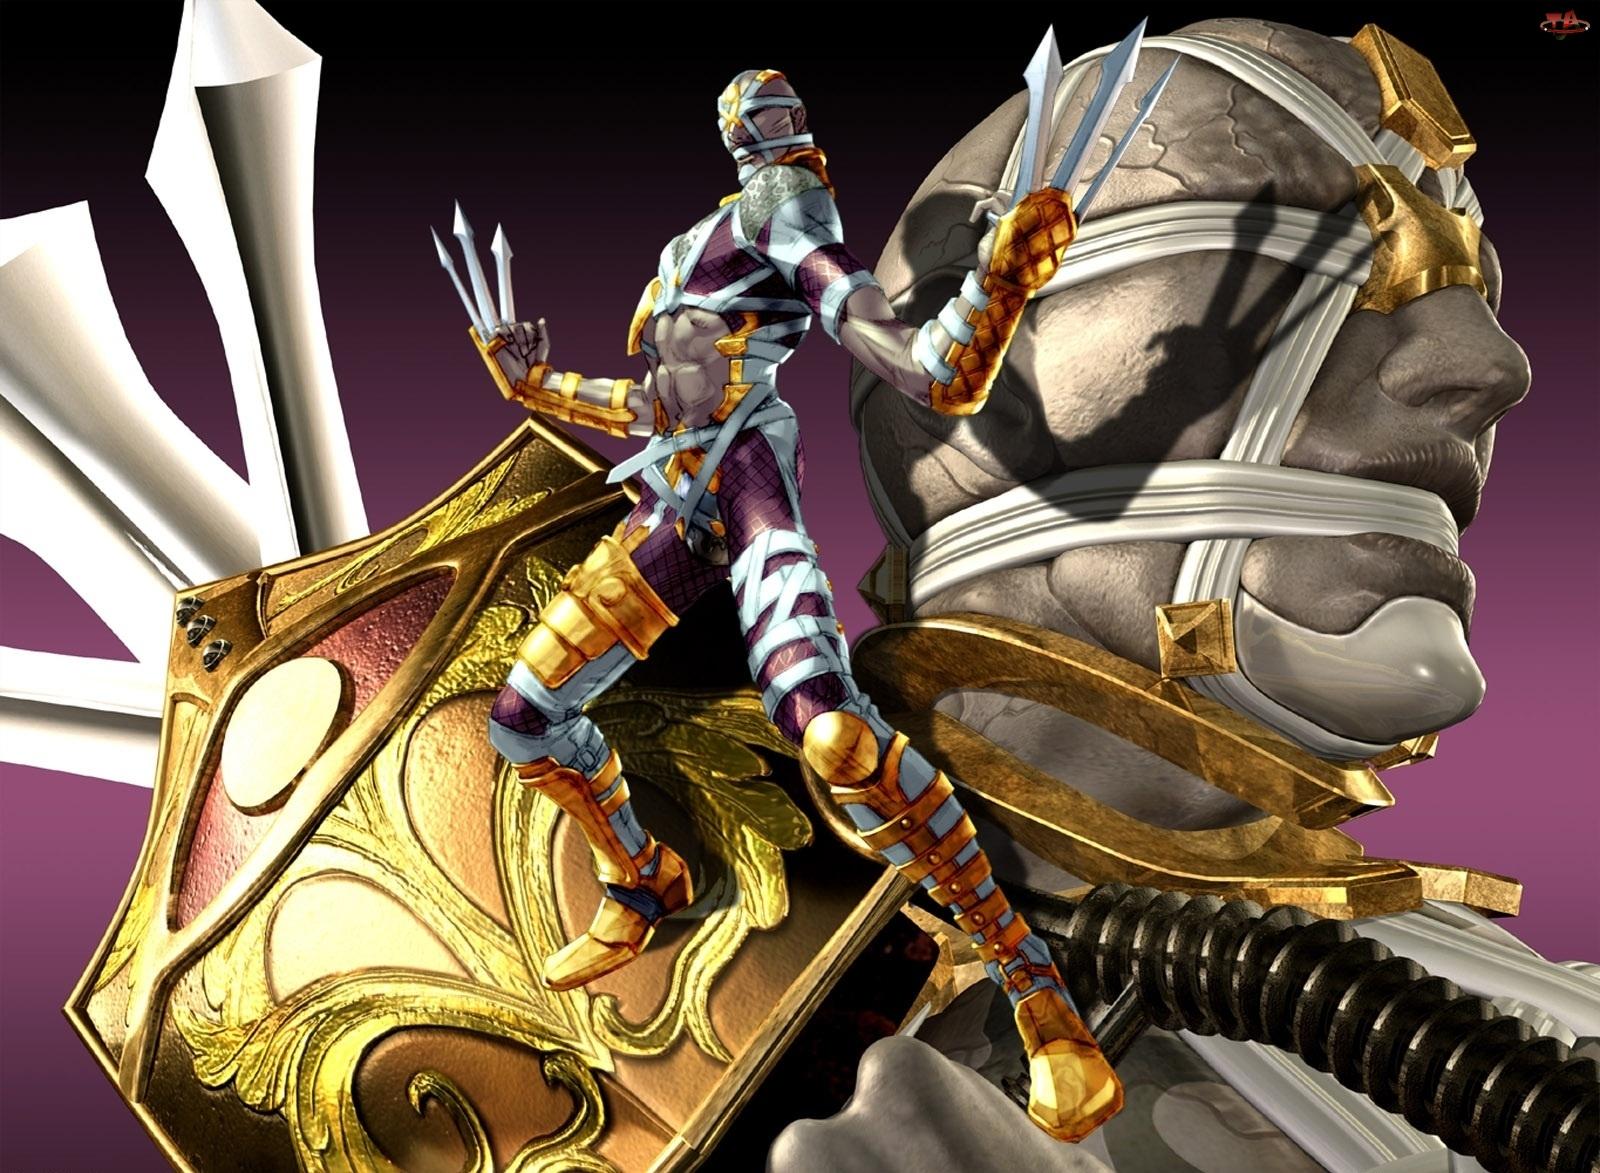 Voldo, Soul Calibur II